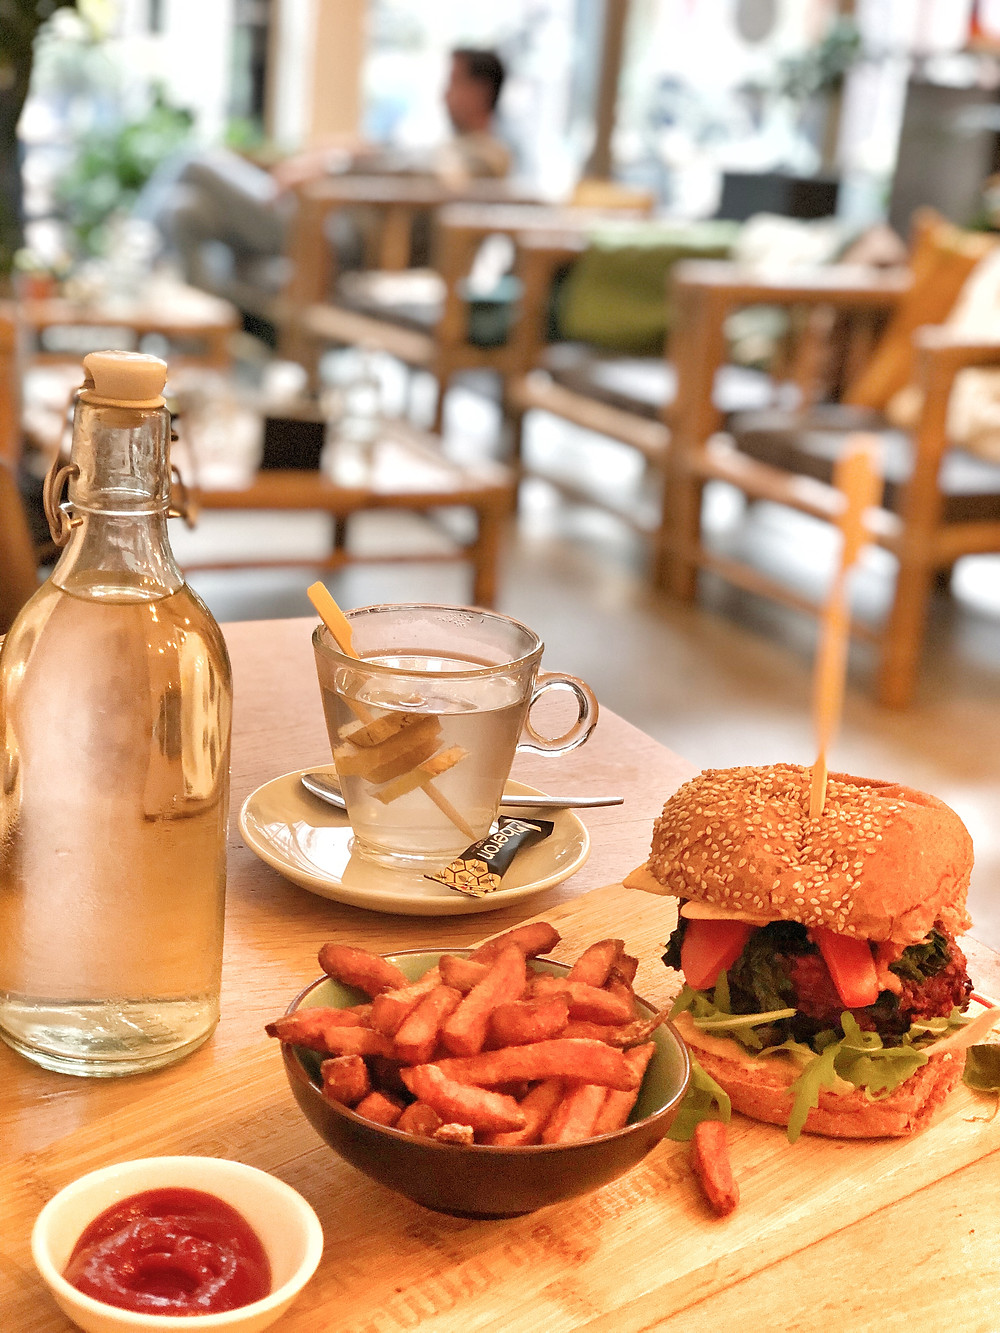 Lunch at Lazy Lemon, Leeuwarden